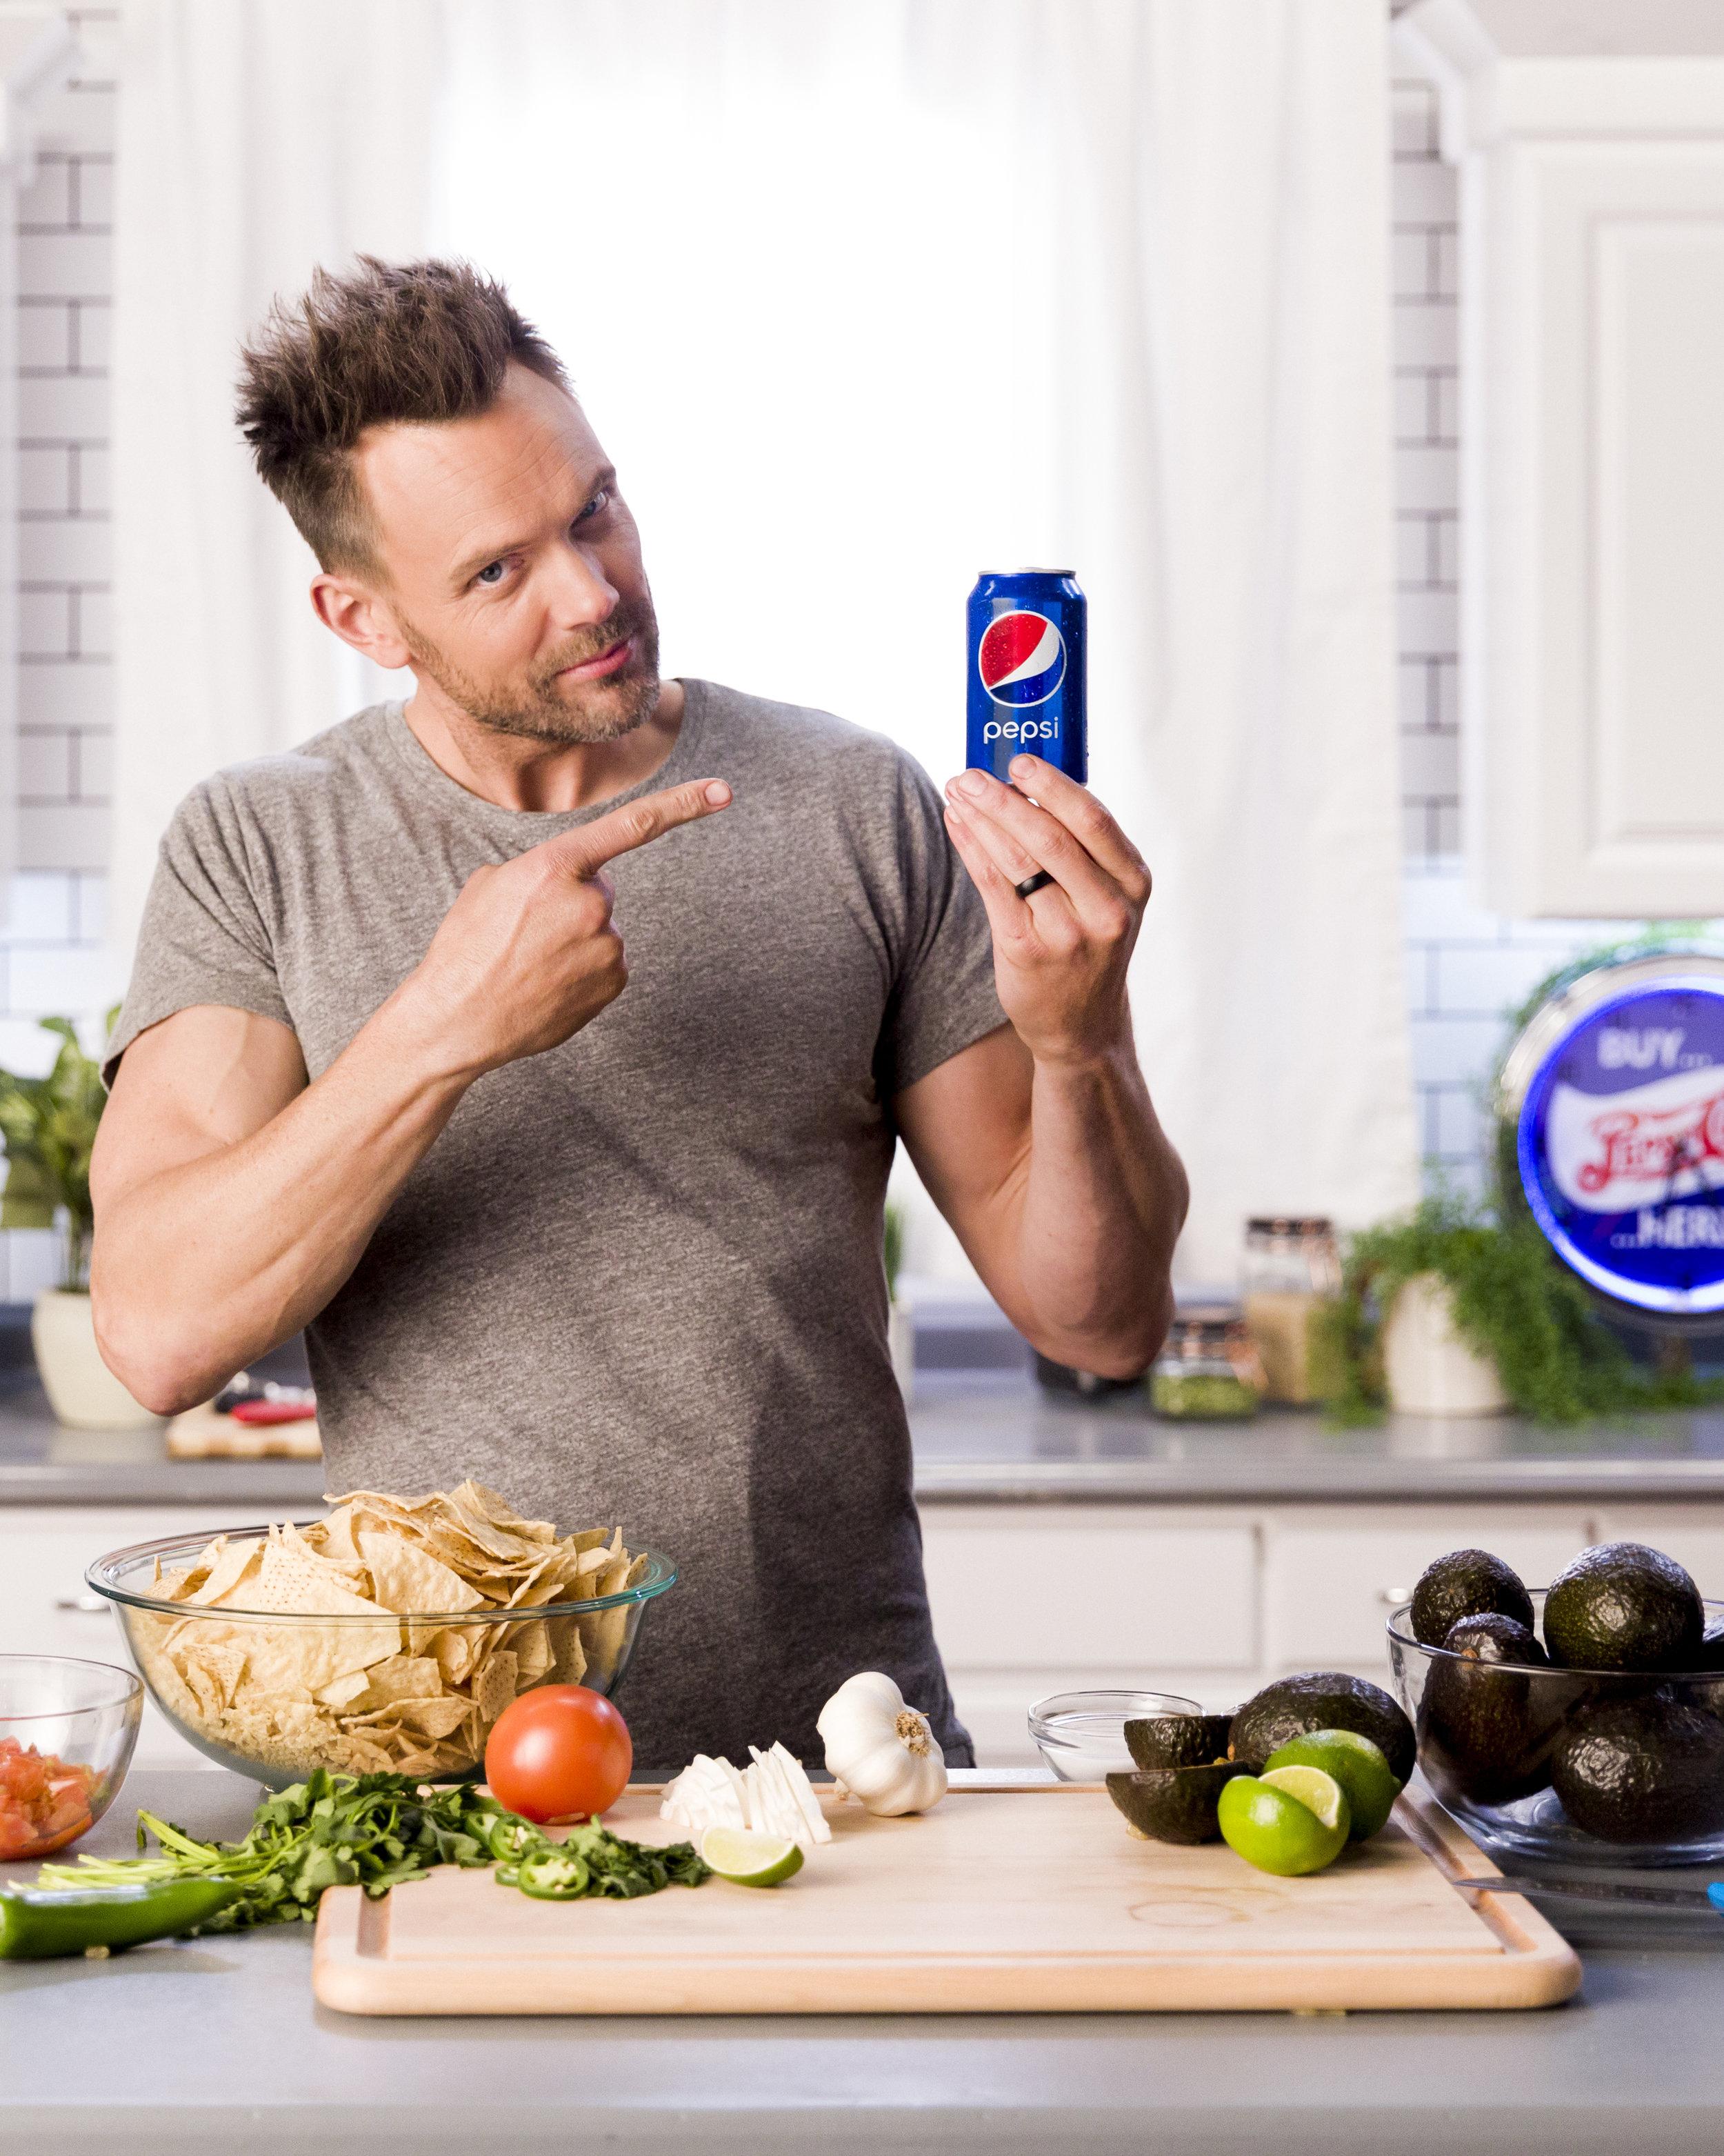 BVH_Pepsi_Version2--2.jpg